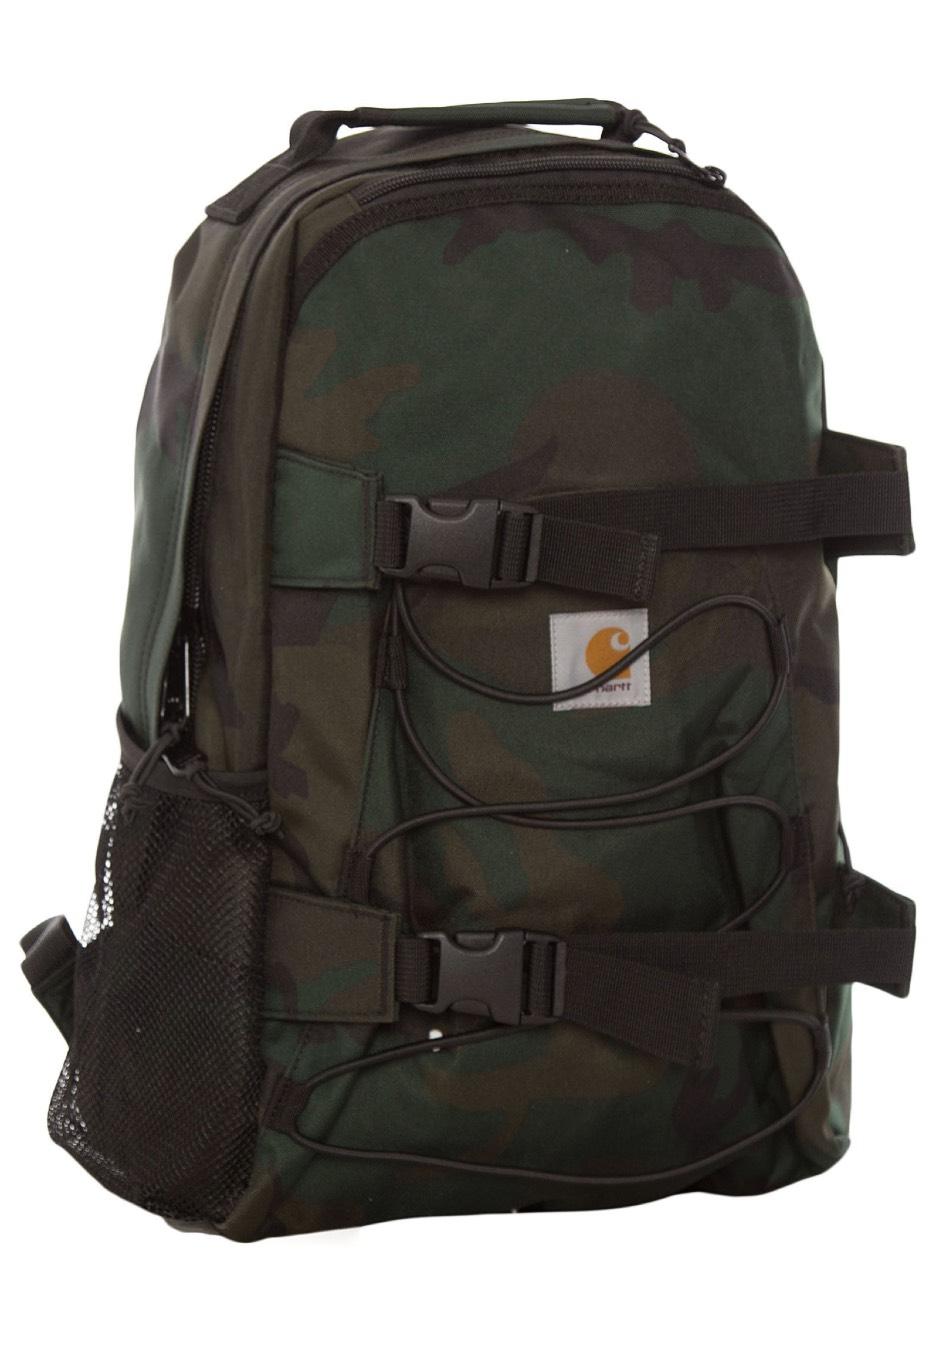 Carhartt WIP - Kickflip Camo Combat Green - Backpack - Streetwear Shop -  Impericon.com US